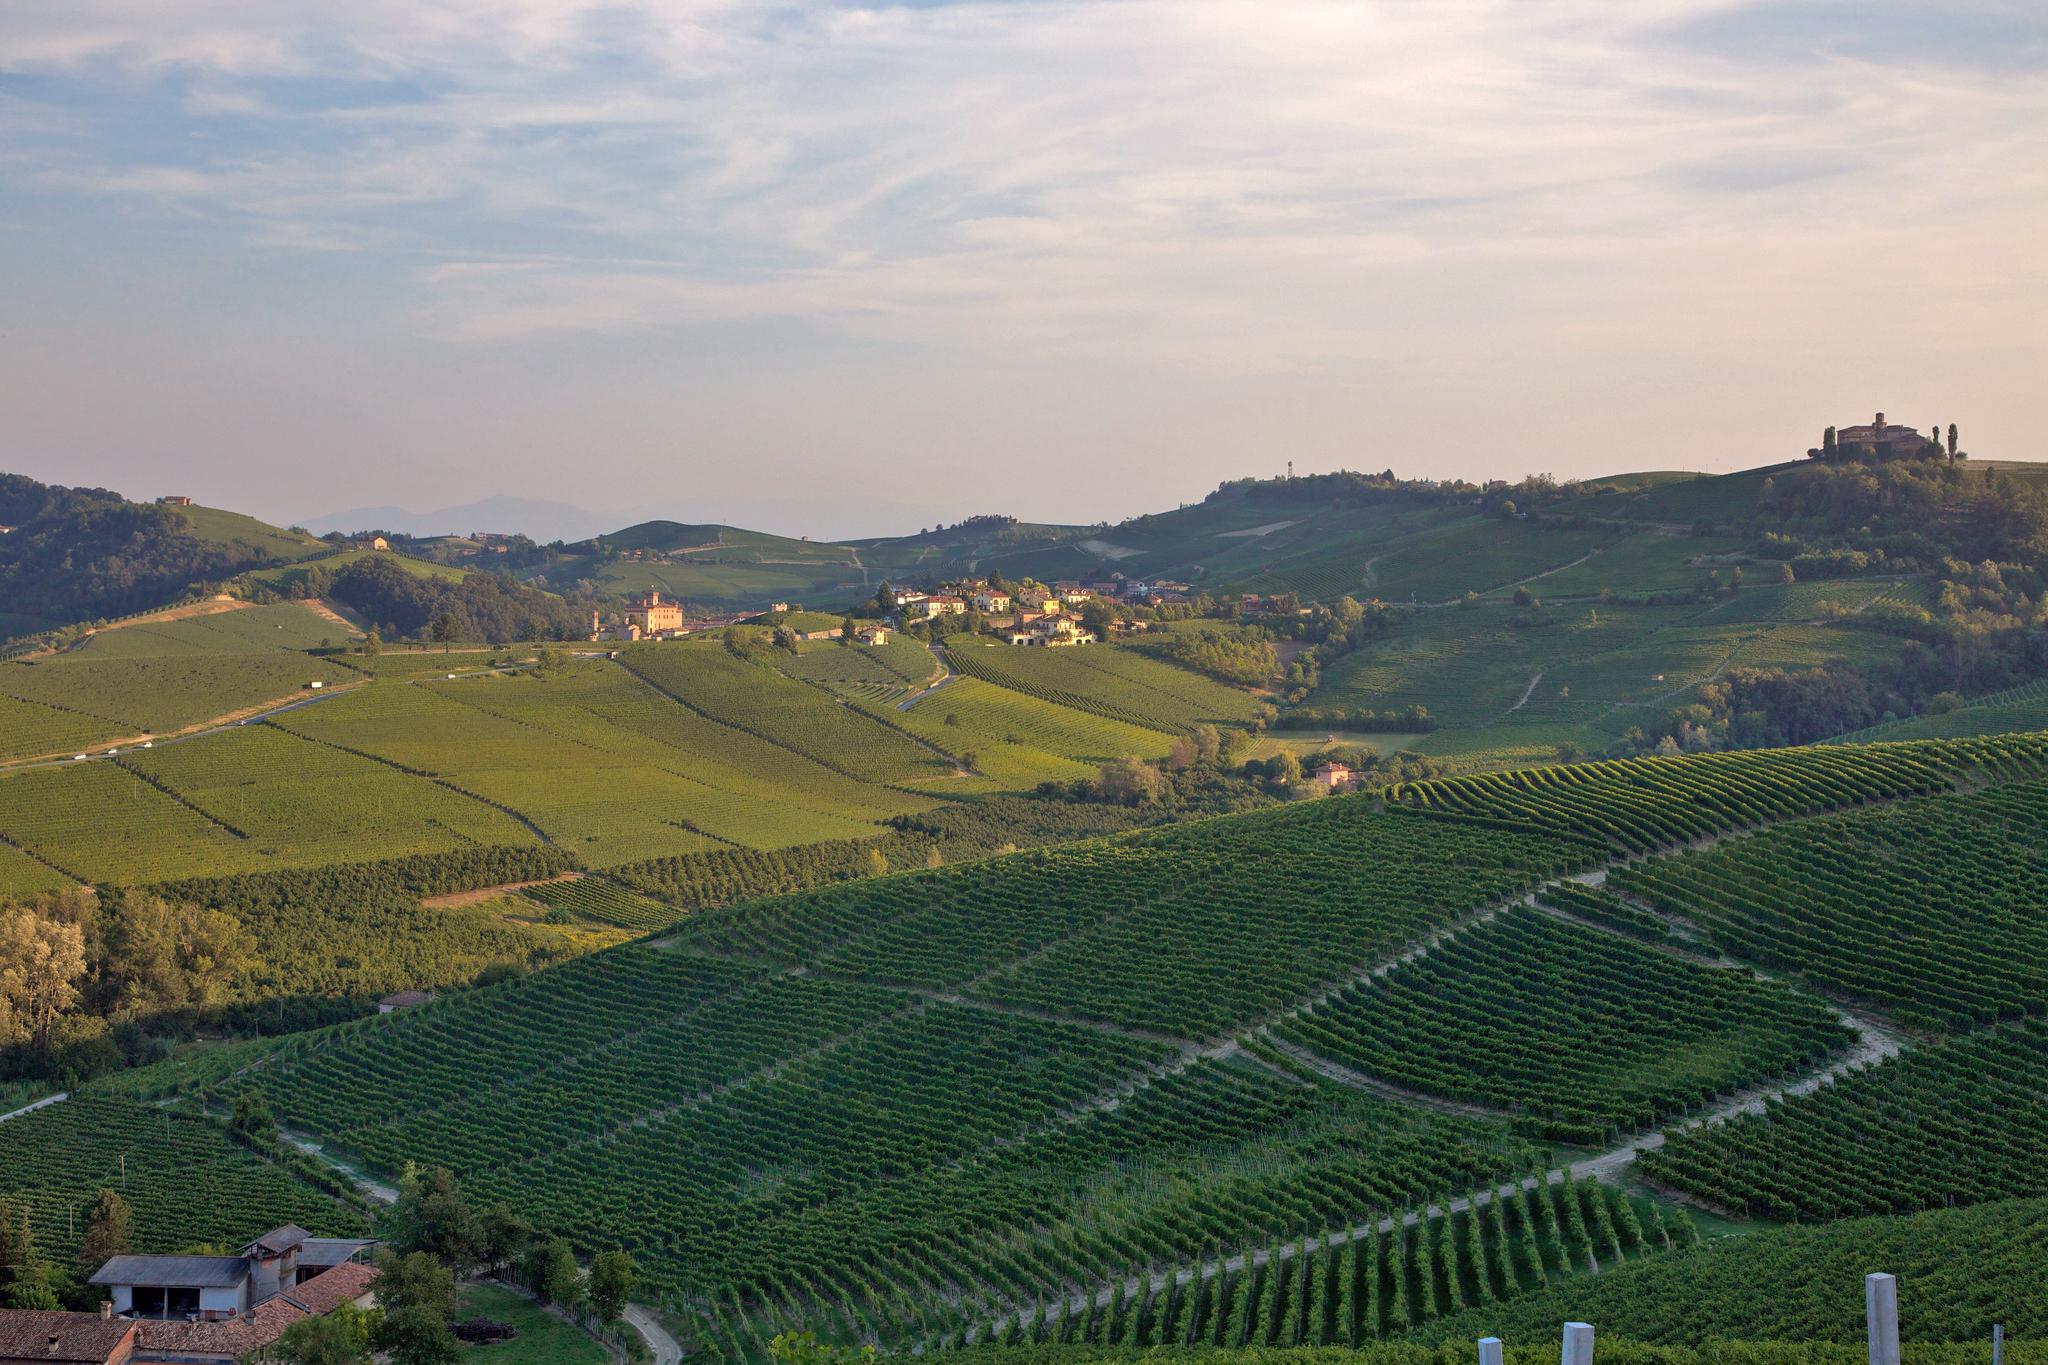 Barolo piedmont vineyards